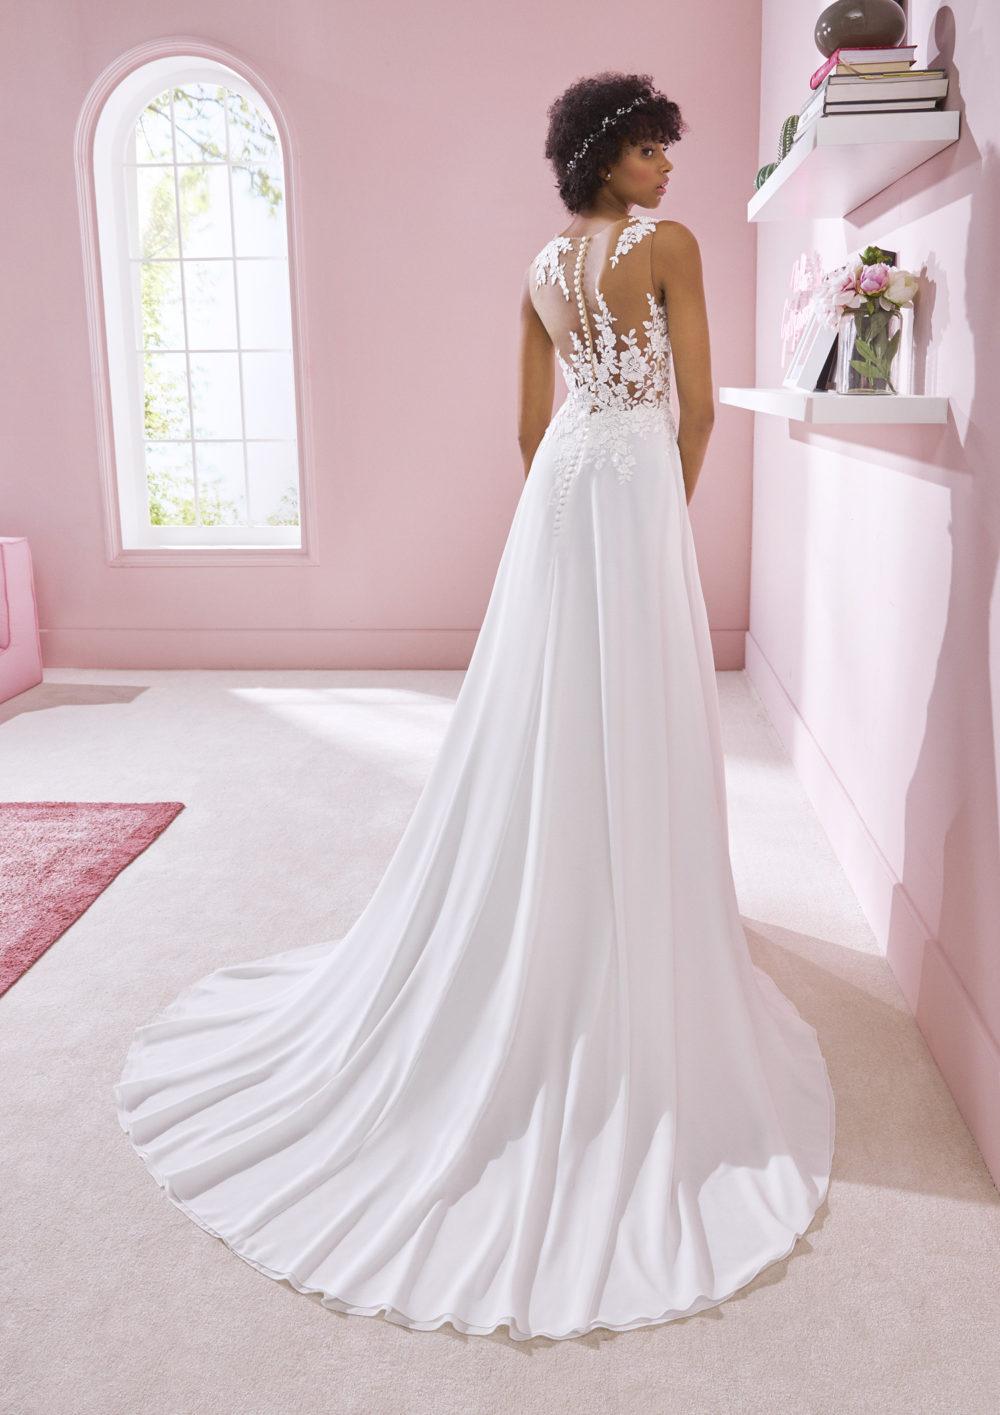 Mariages: abito da sposa Poème 2020 a Vicenza, Verona, Padova, Veneto AMA